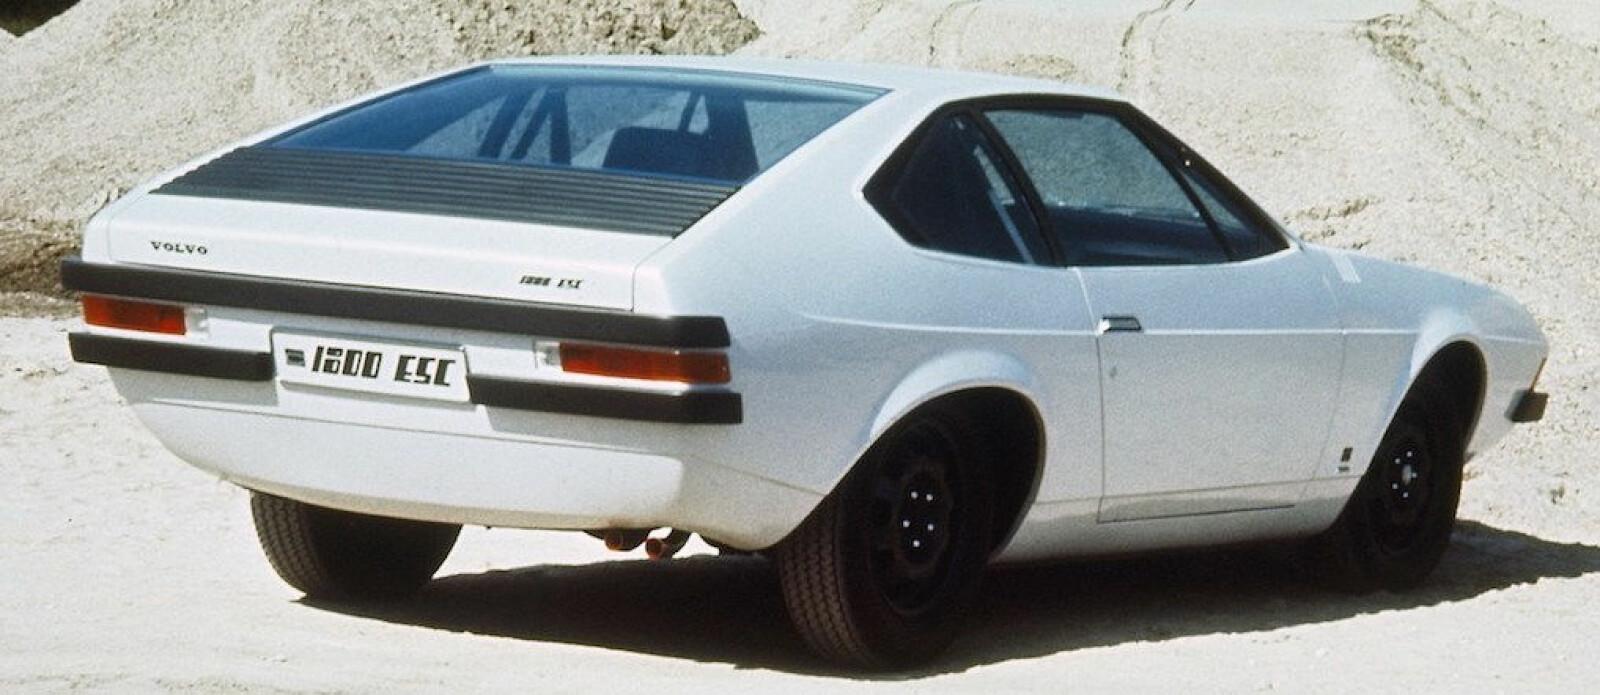 "<span class=""BOLD"" style=""""><strong style=""font-weight: bold;"">ITALIENSK SPORTSBIL?: </strong>Nei, dette er Volvo Viking fra 70-tallet.</span>"